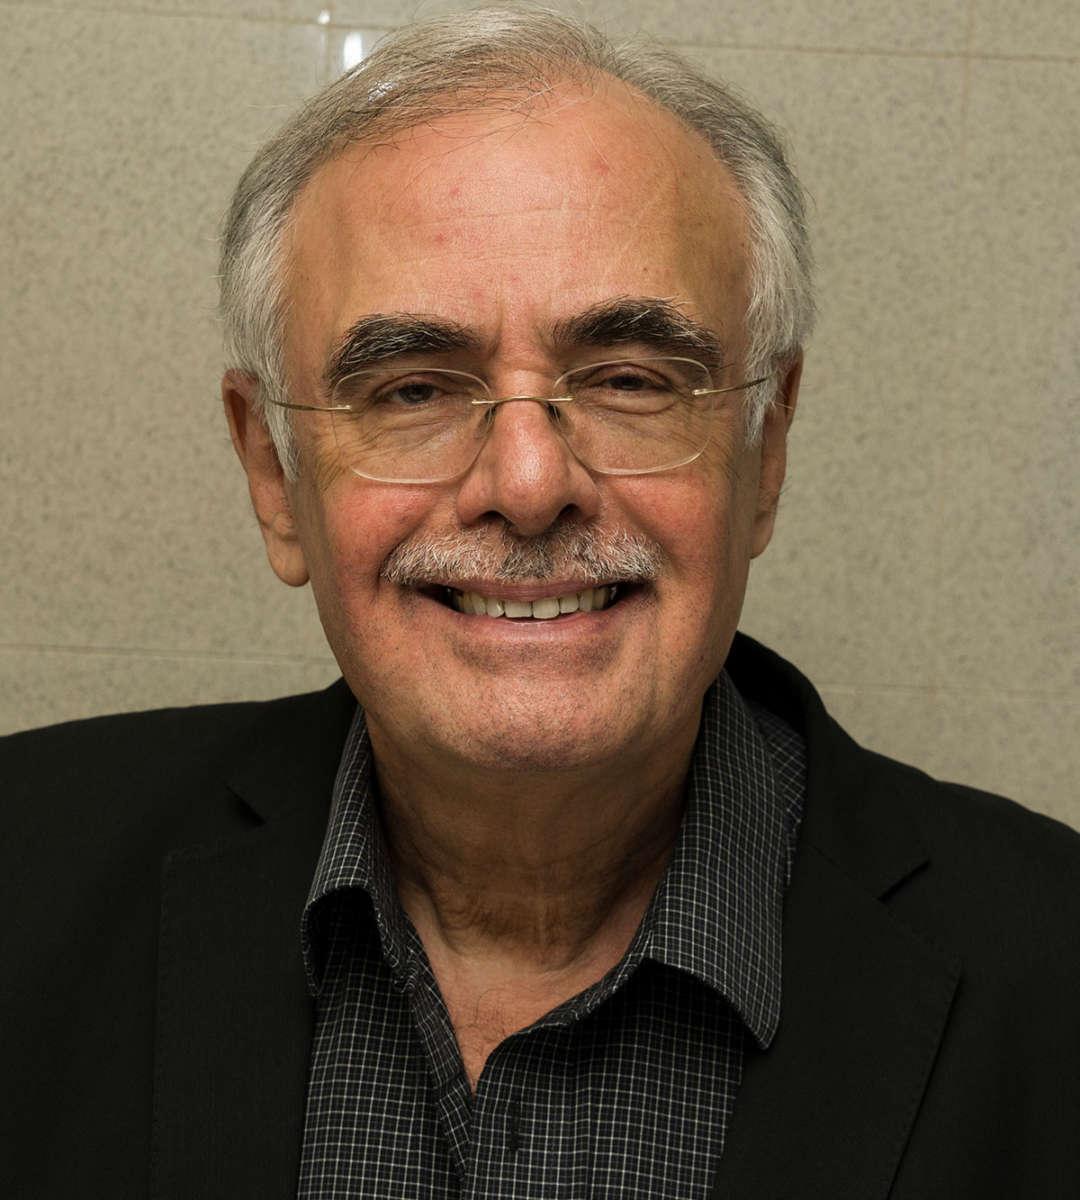 Dr. Faram Irani, MD, FCPS, FICOG, DGO, DFP